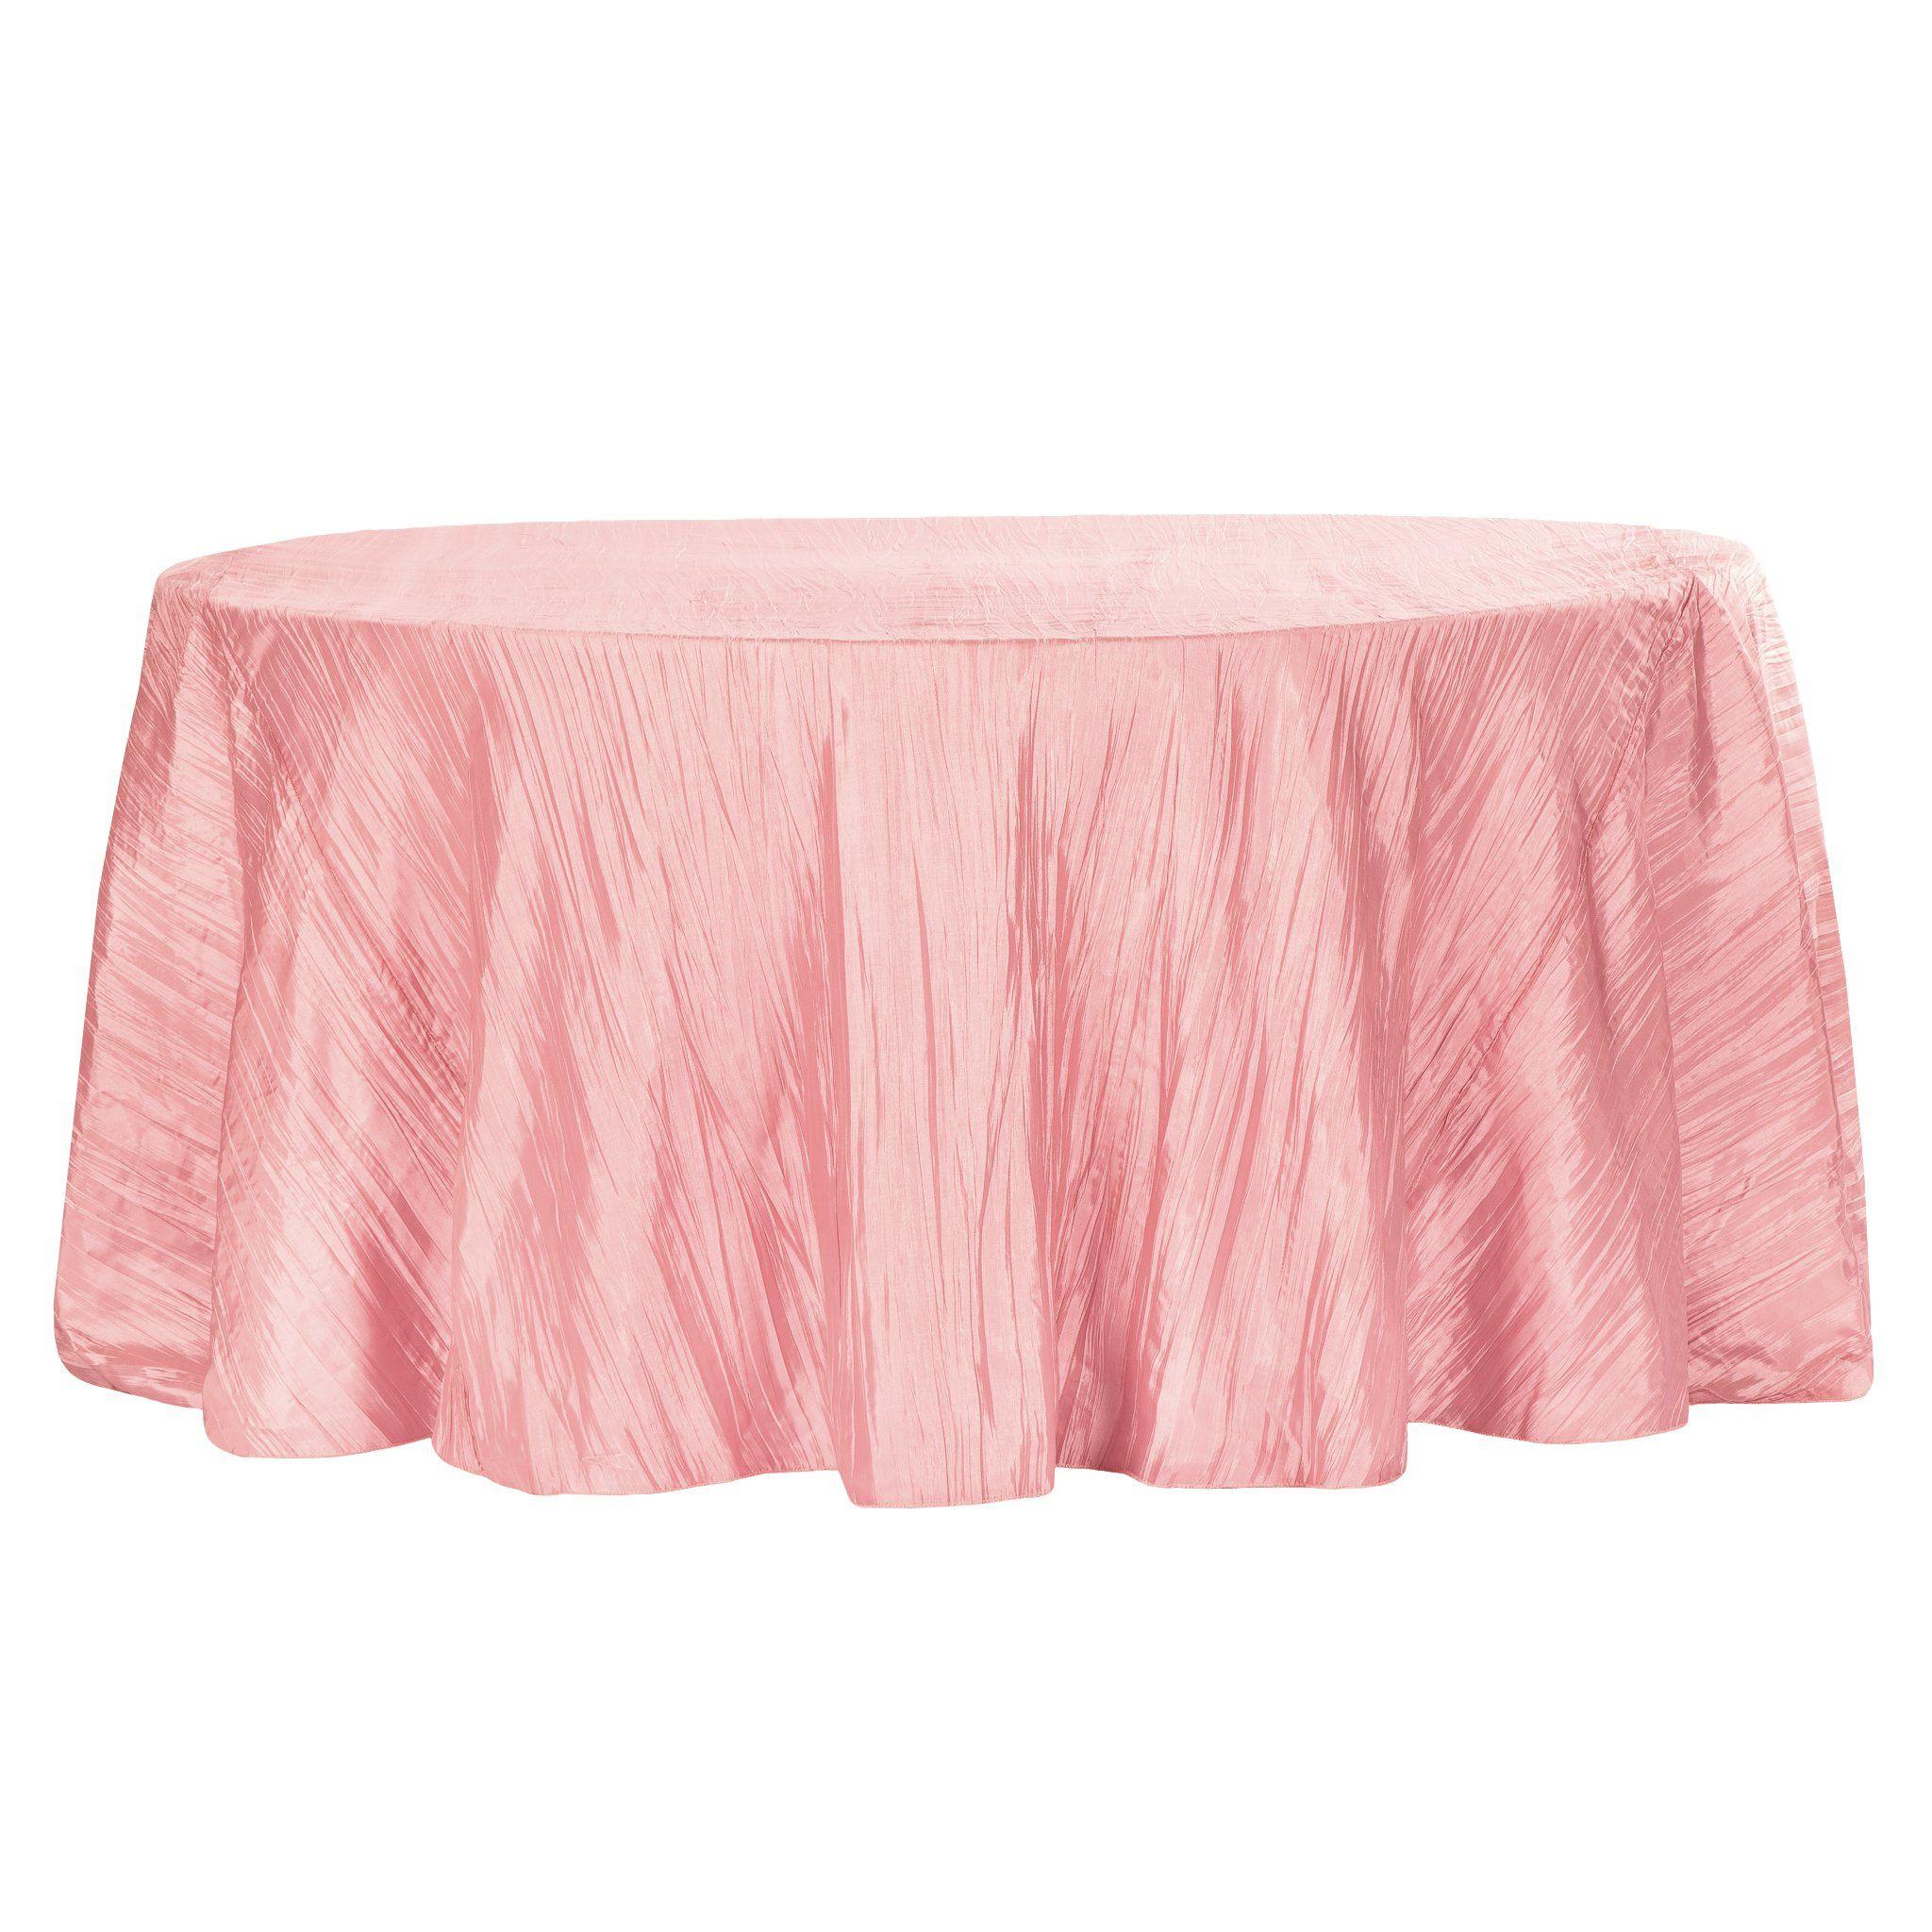 Accordion Crinkle Taffeta 120 Round Tablecloth Dusty Rose Mauve